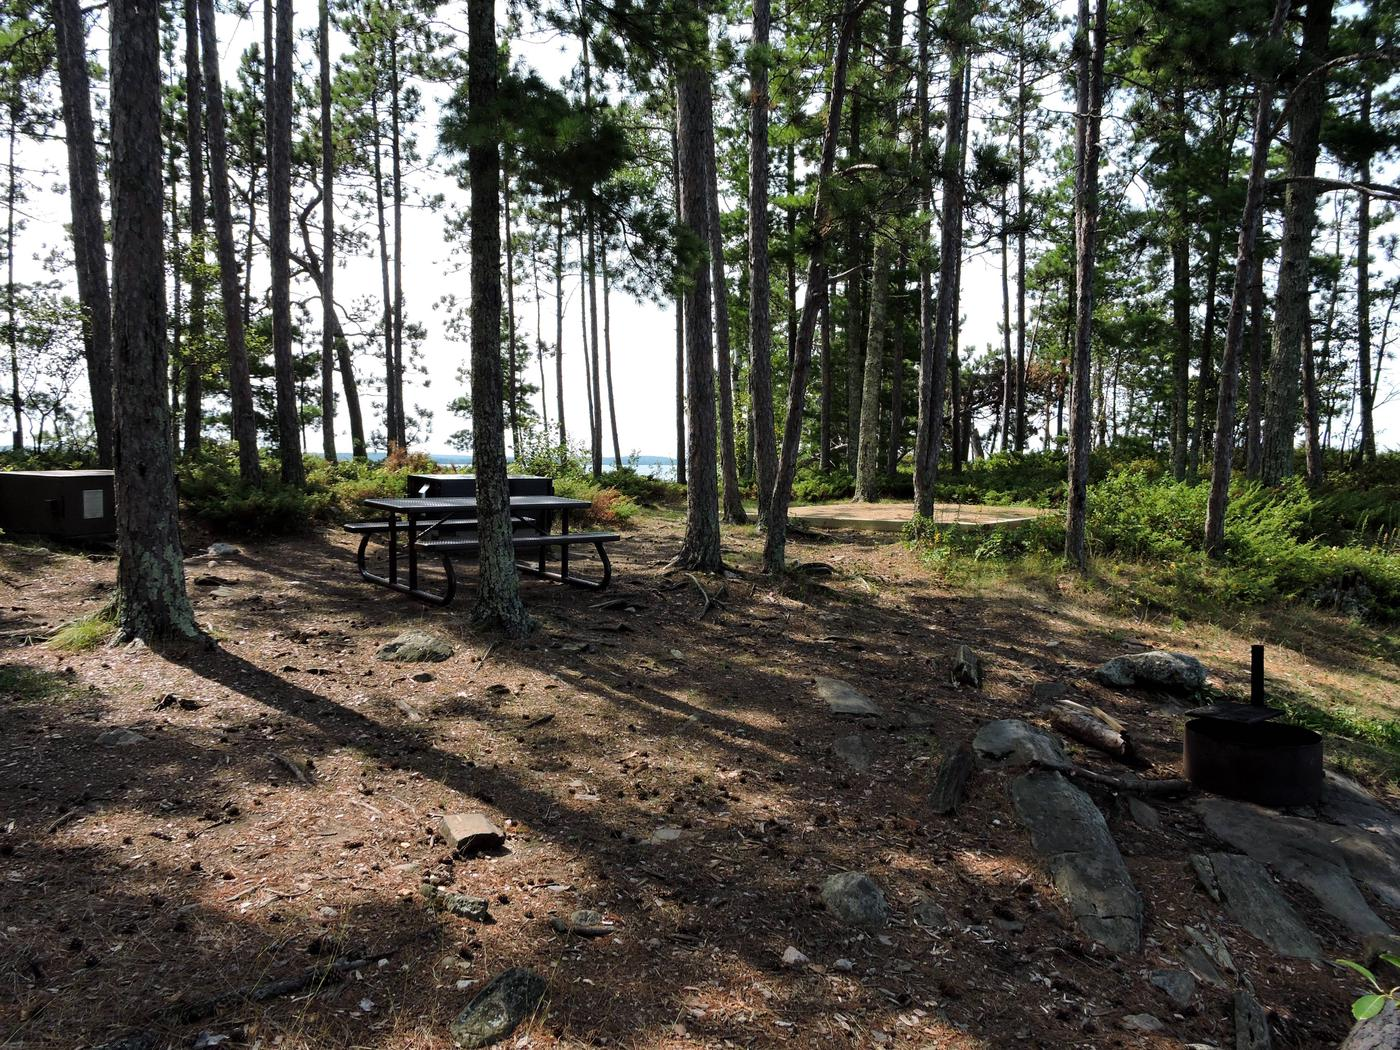 N30 - Pat Smith IslandView of campsite